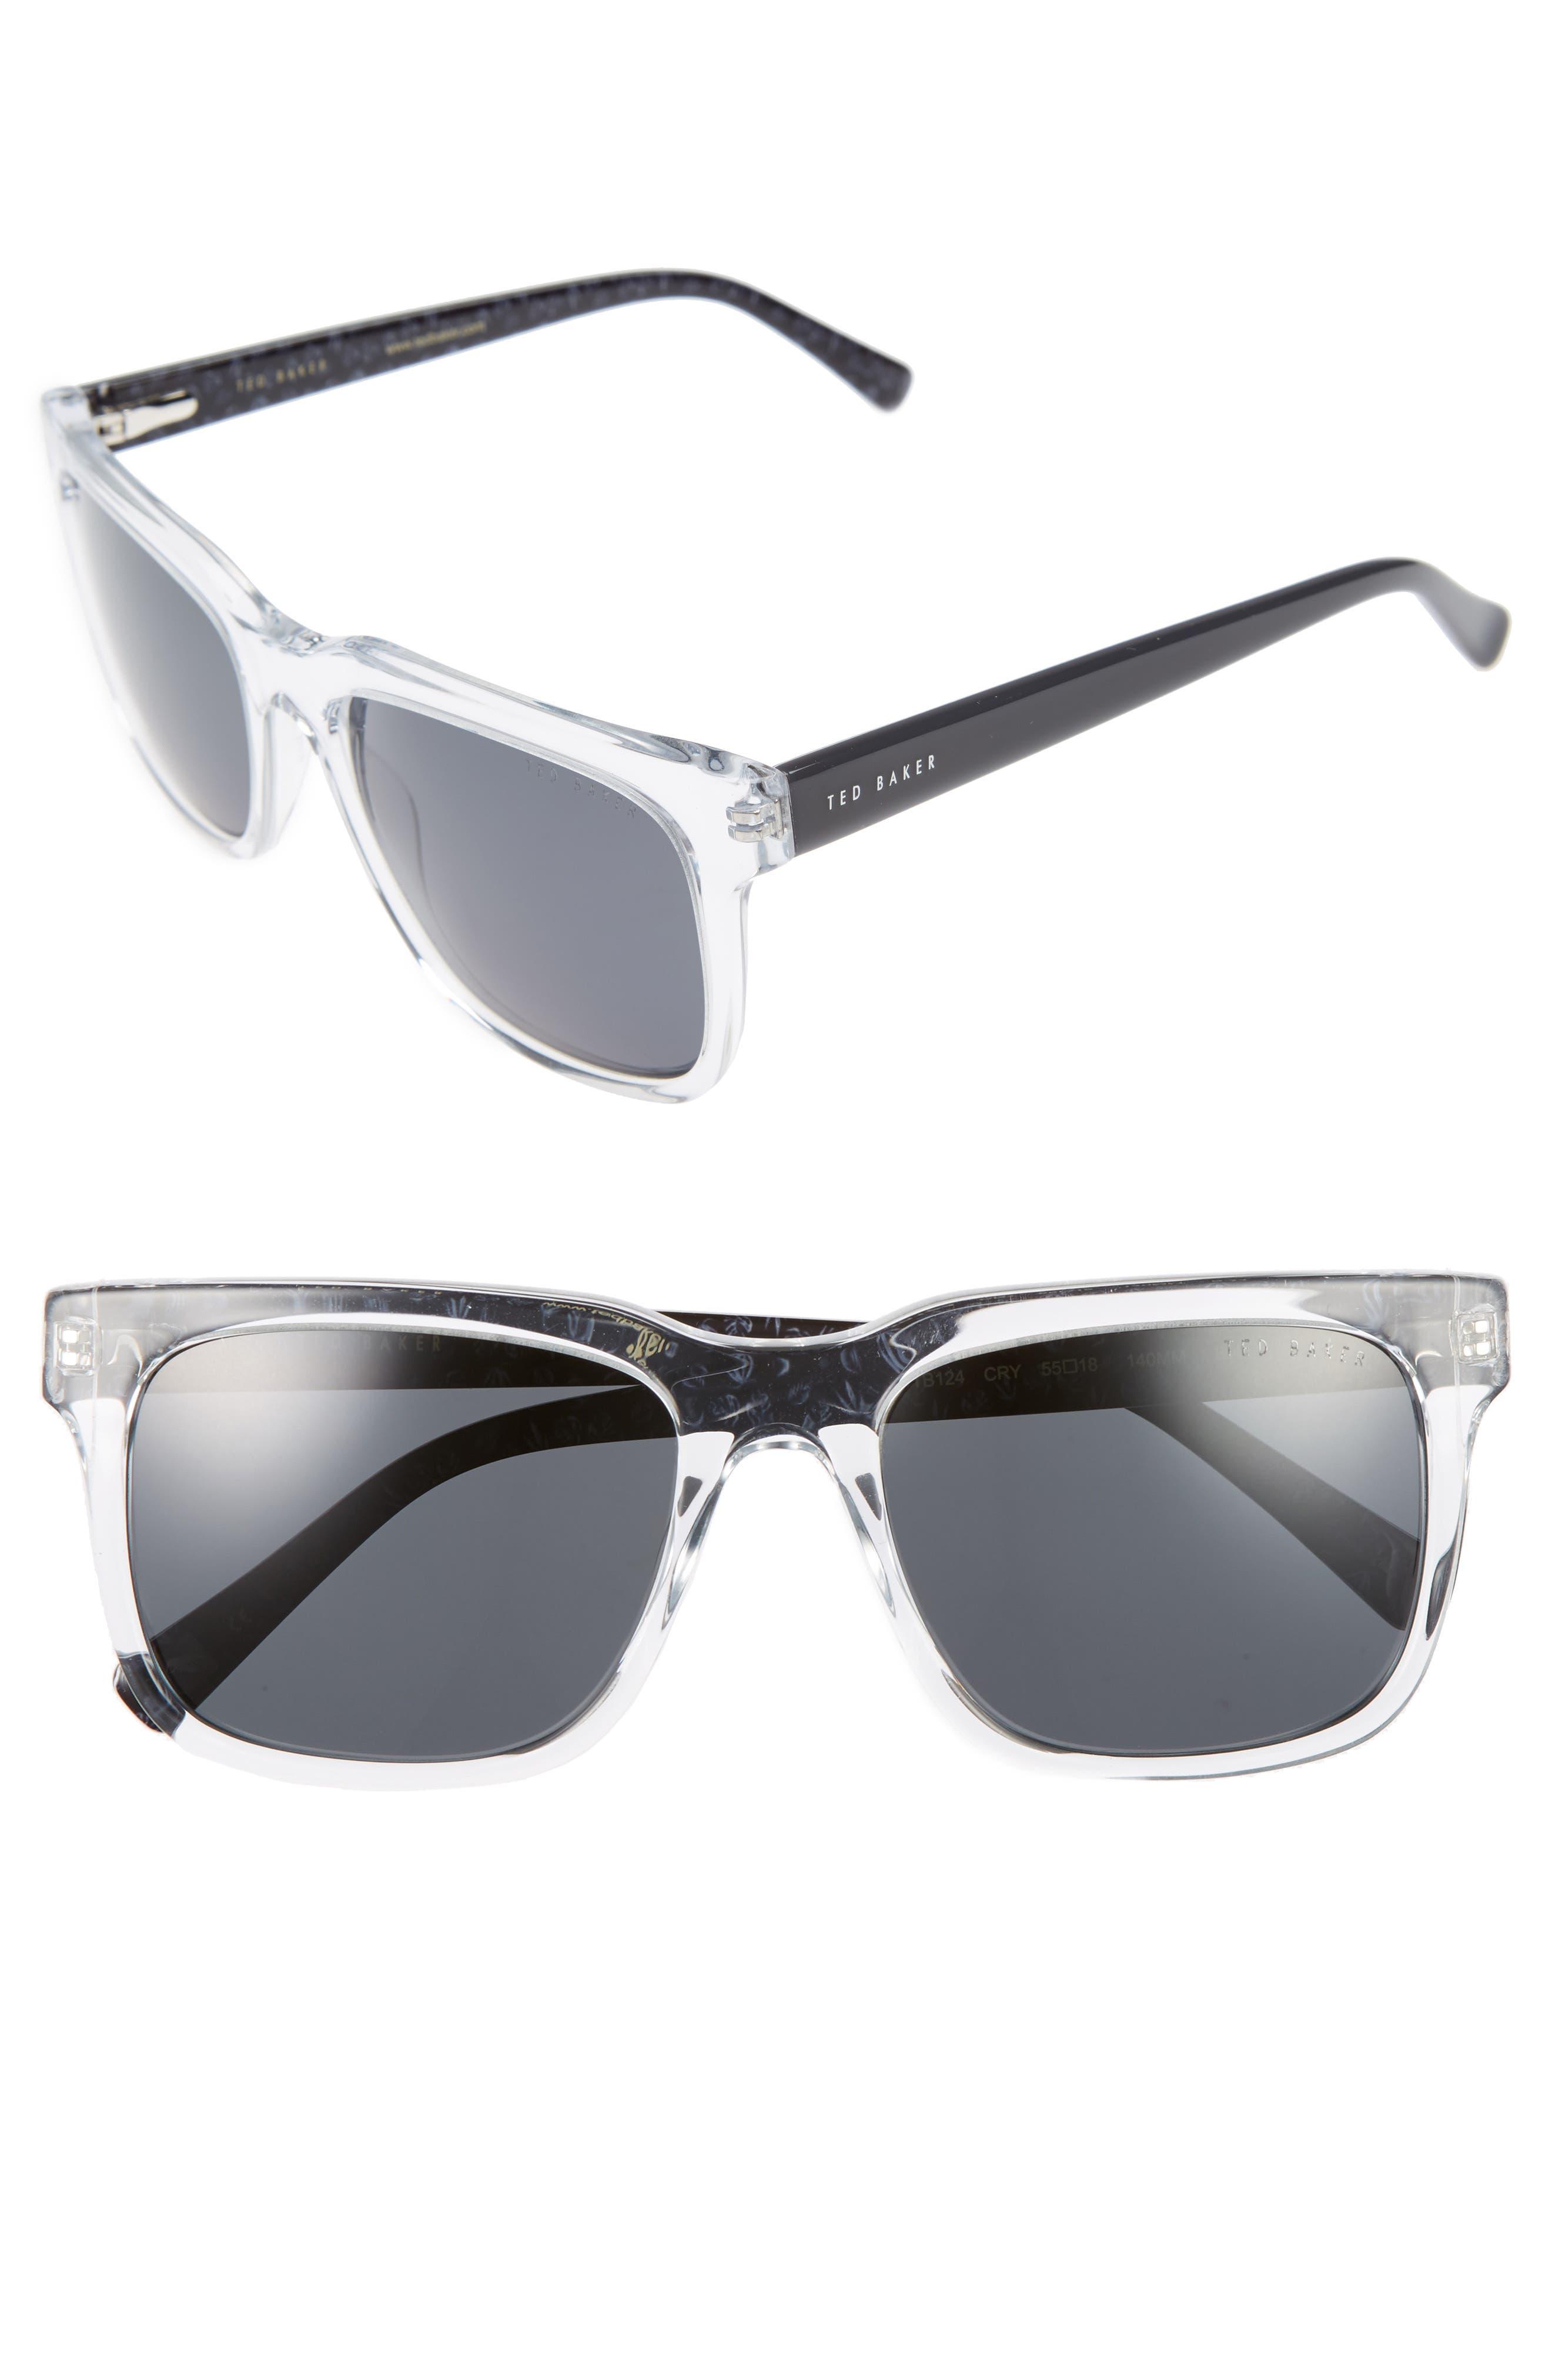 TED BAKER LONDON 55mm Polarized Sunglasses